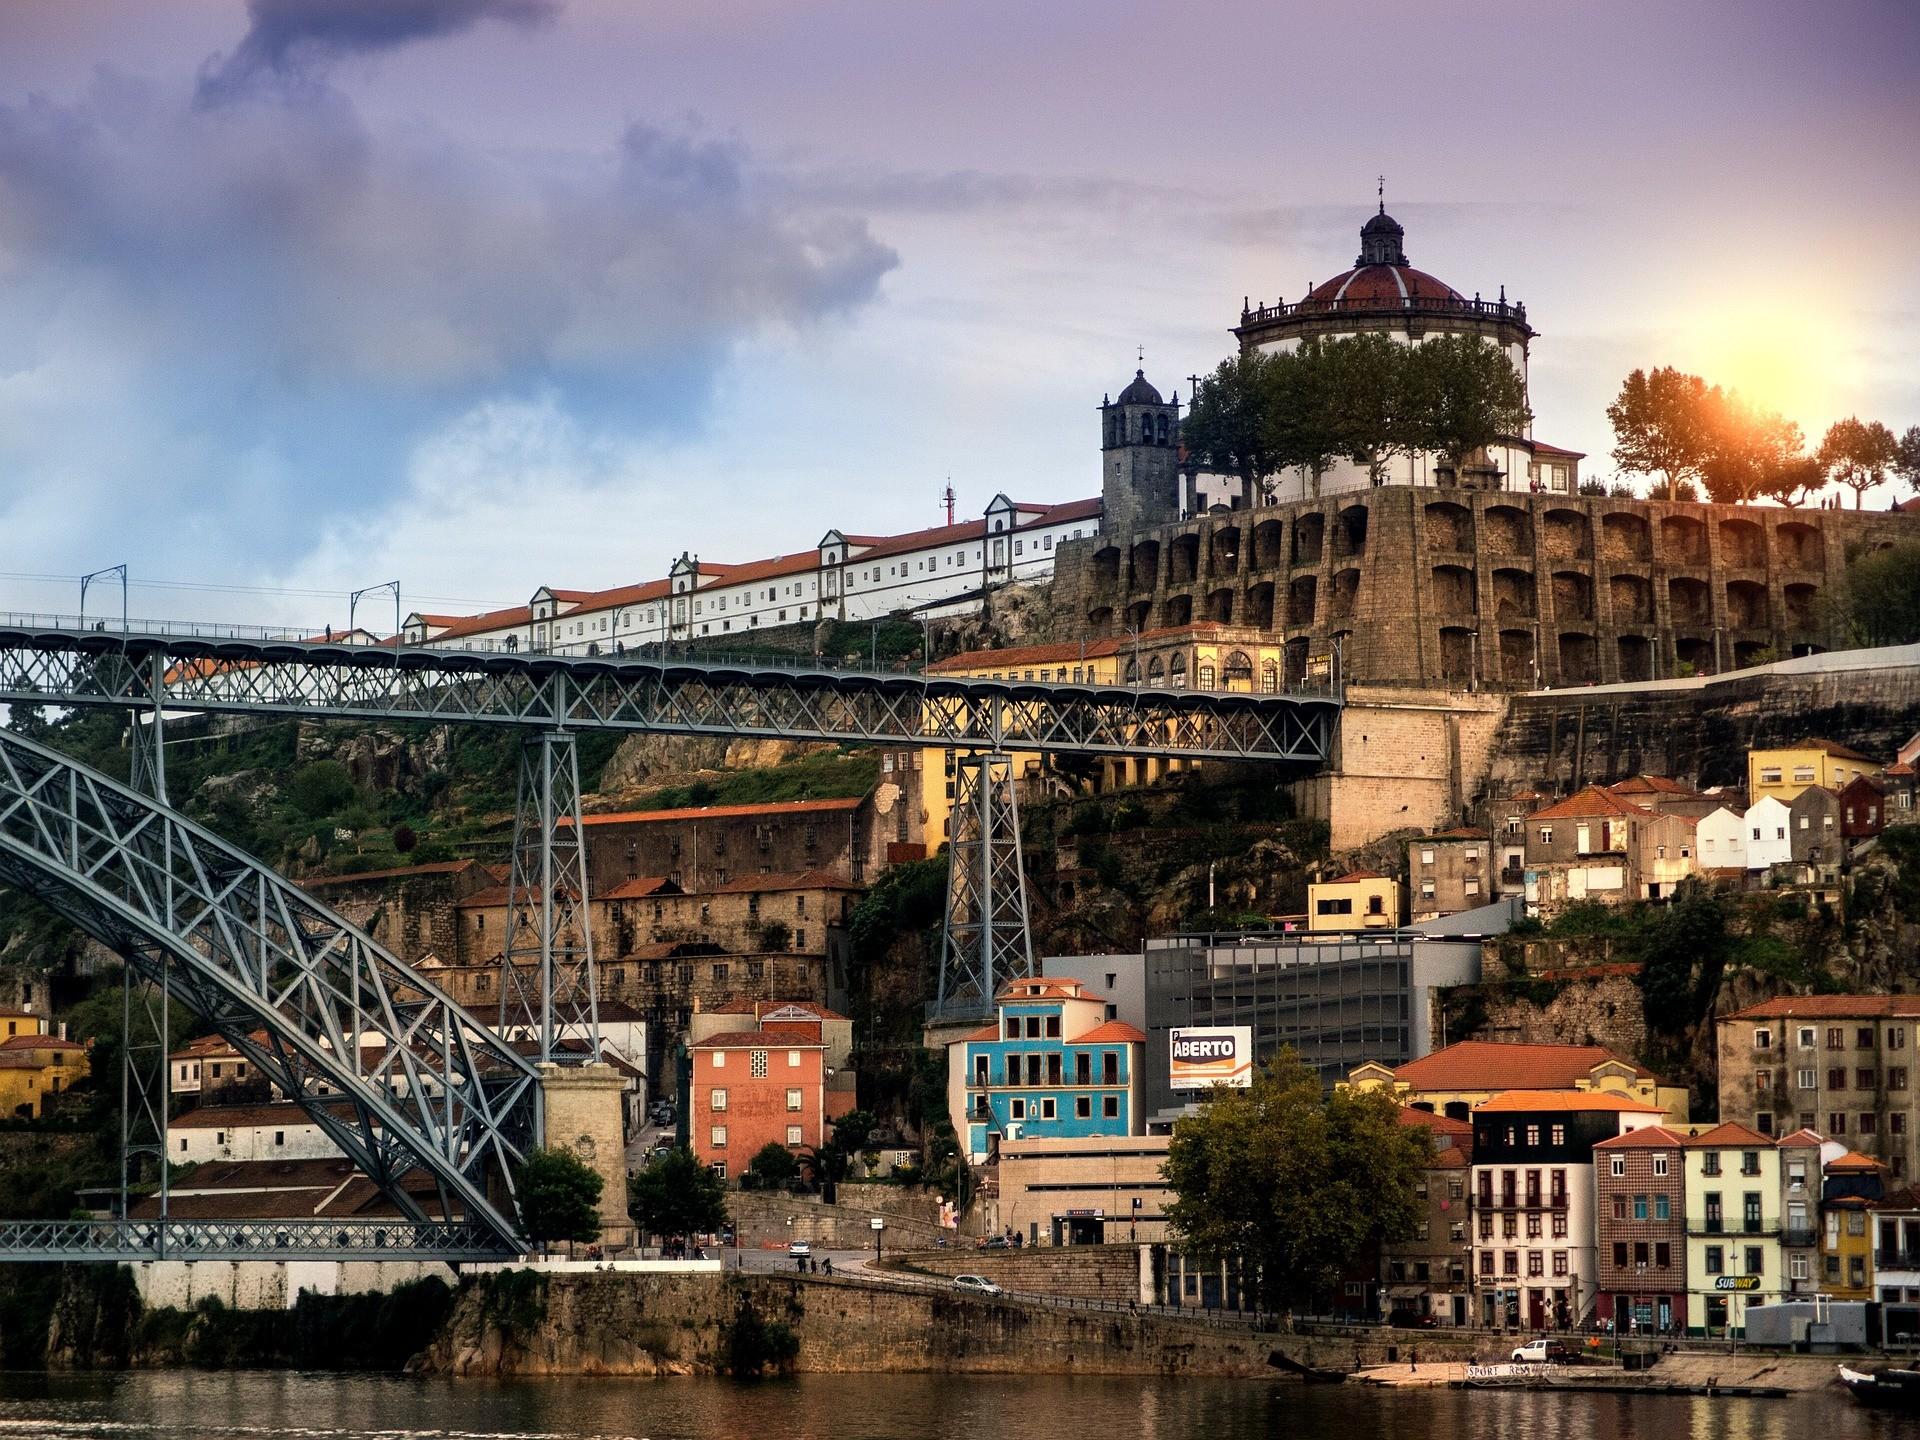 Experiência de Erasmus no Porto, Portugal, por Tanja